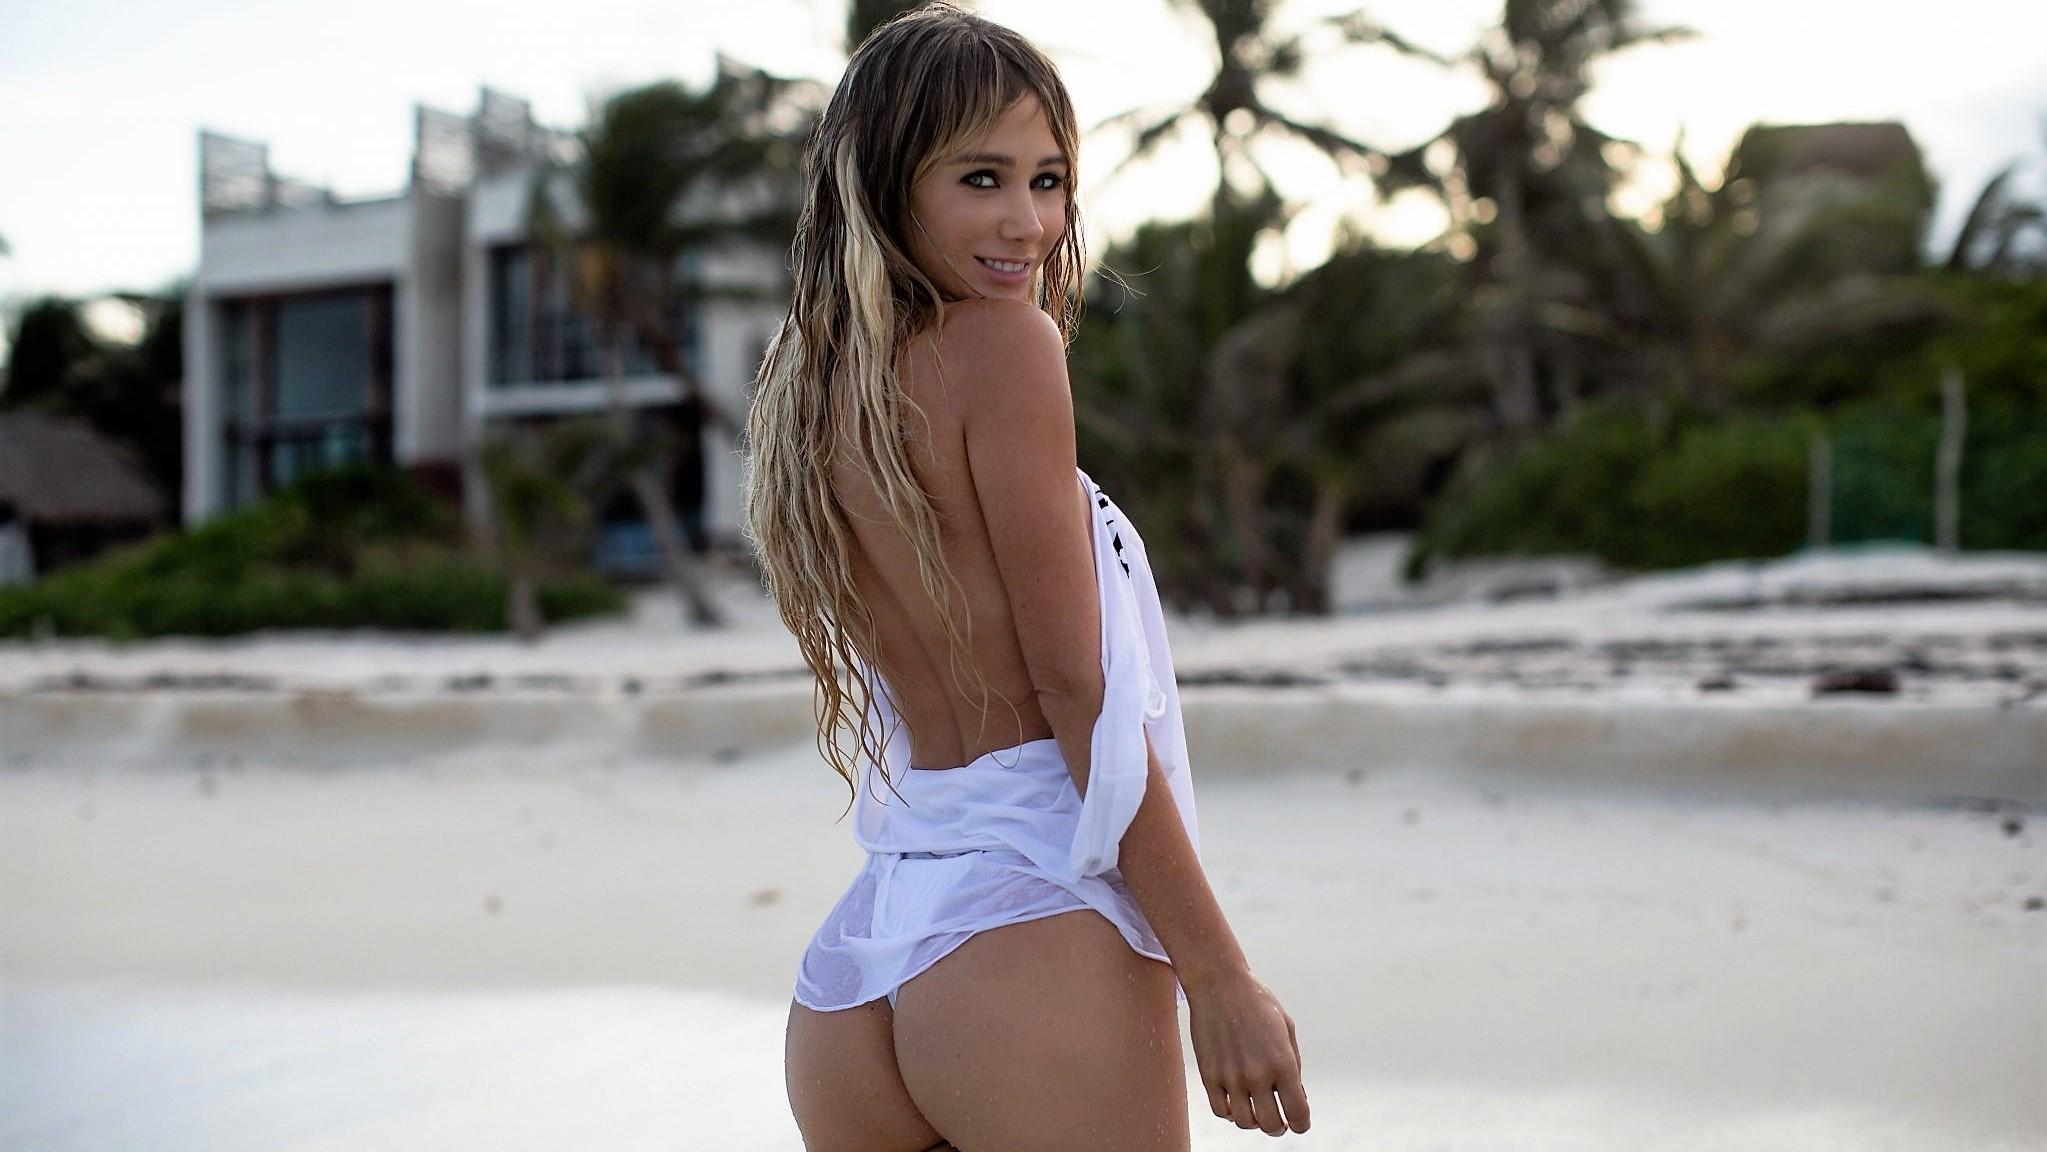 Fondos De Pantalla Sara Jean Underwood Rubia Playa Ojos